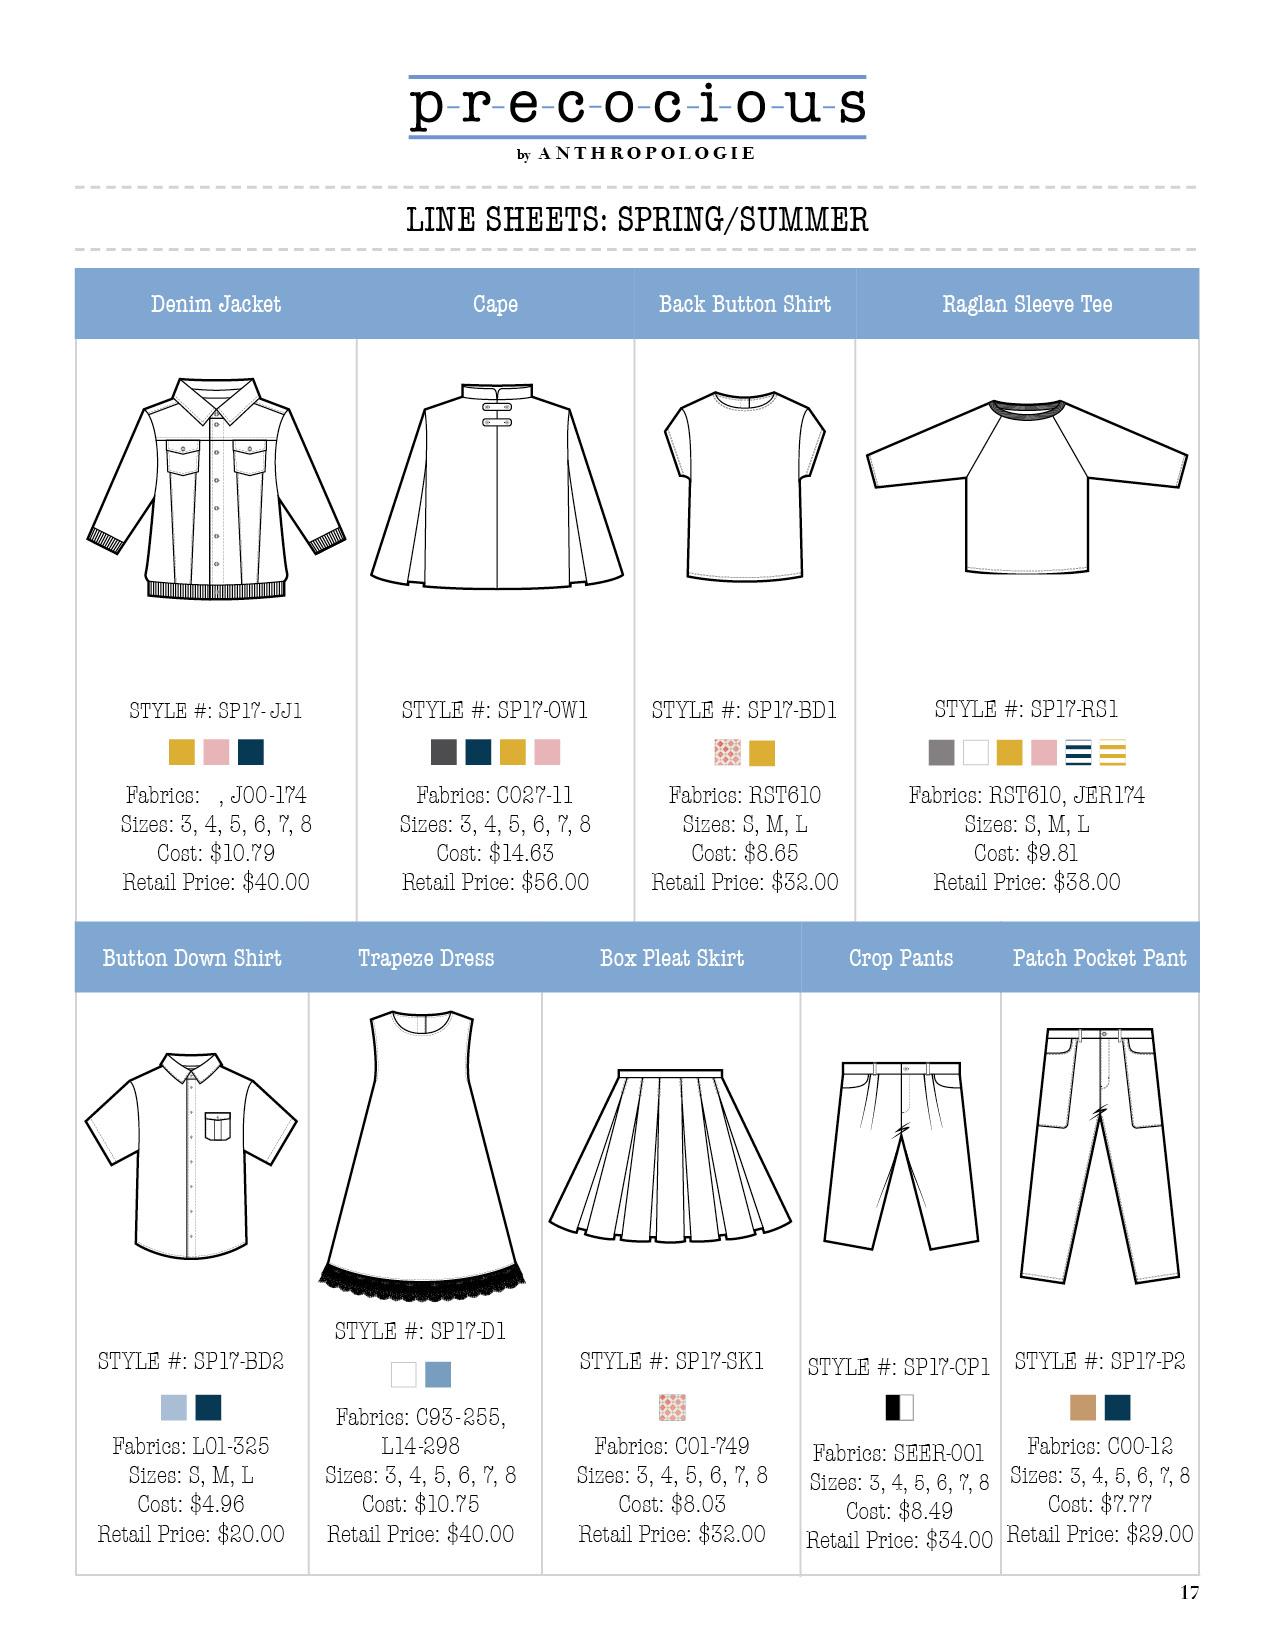 Precocious Product Development Line Extension Line Sheet